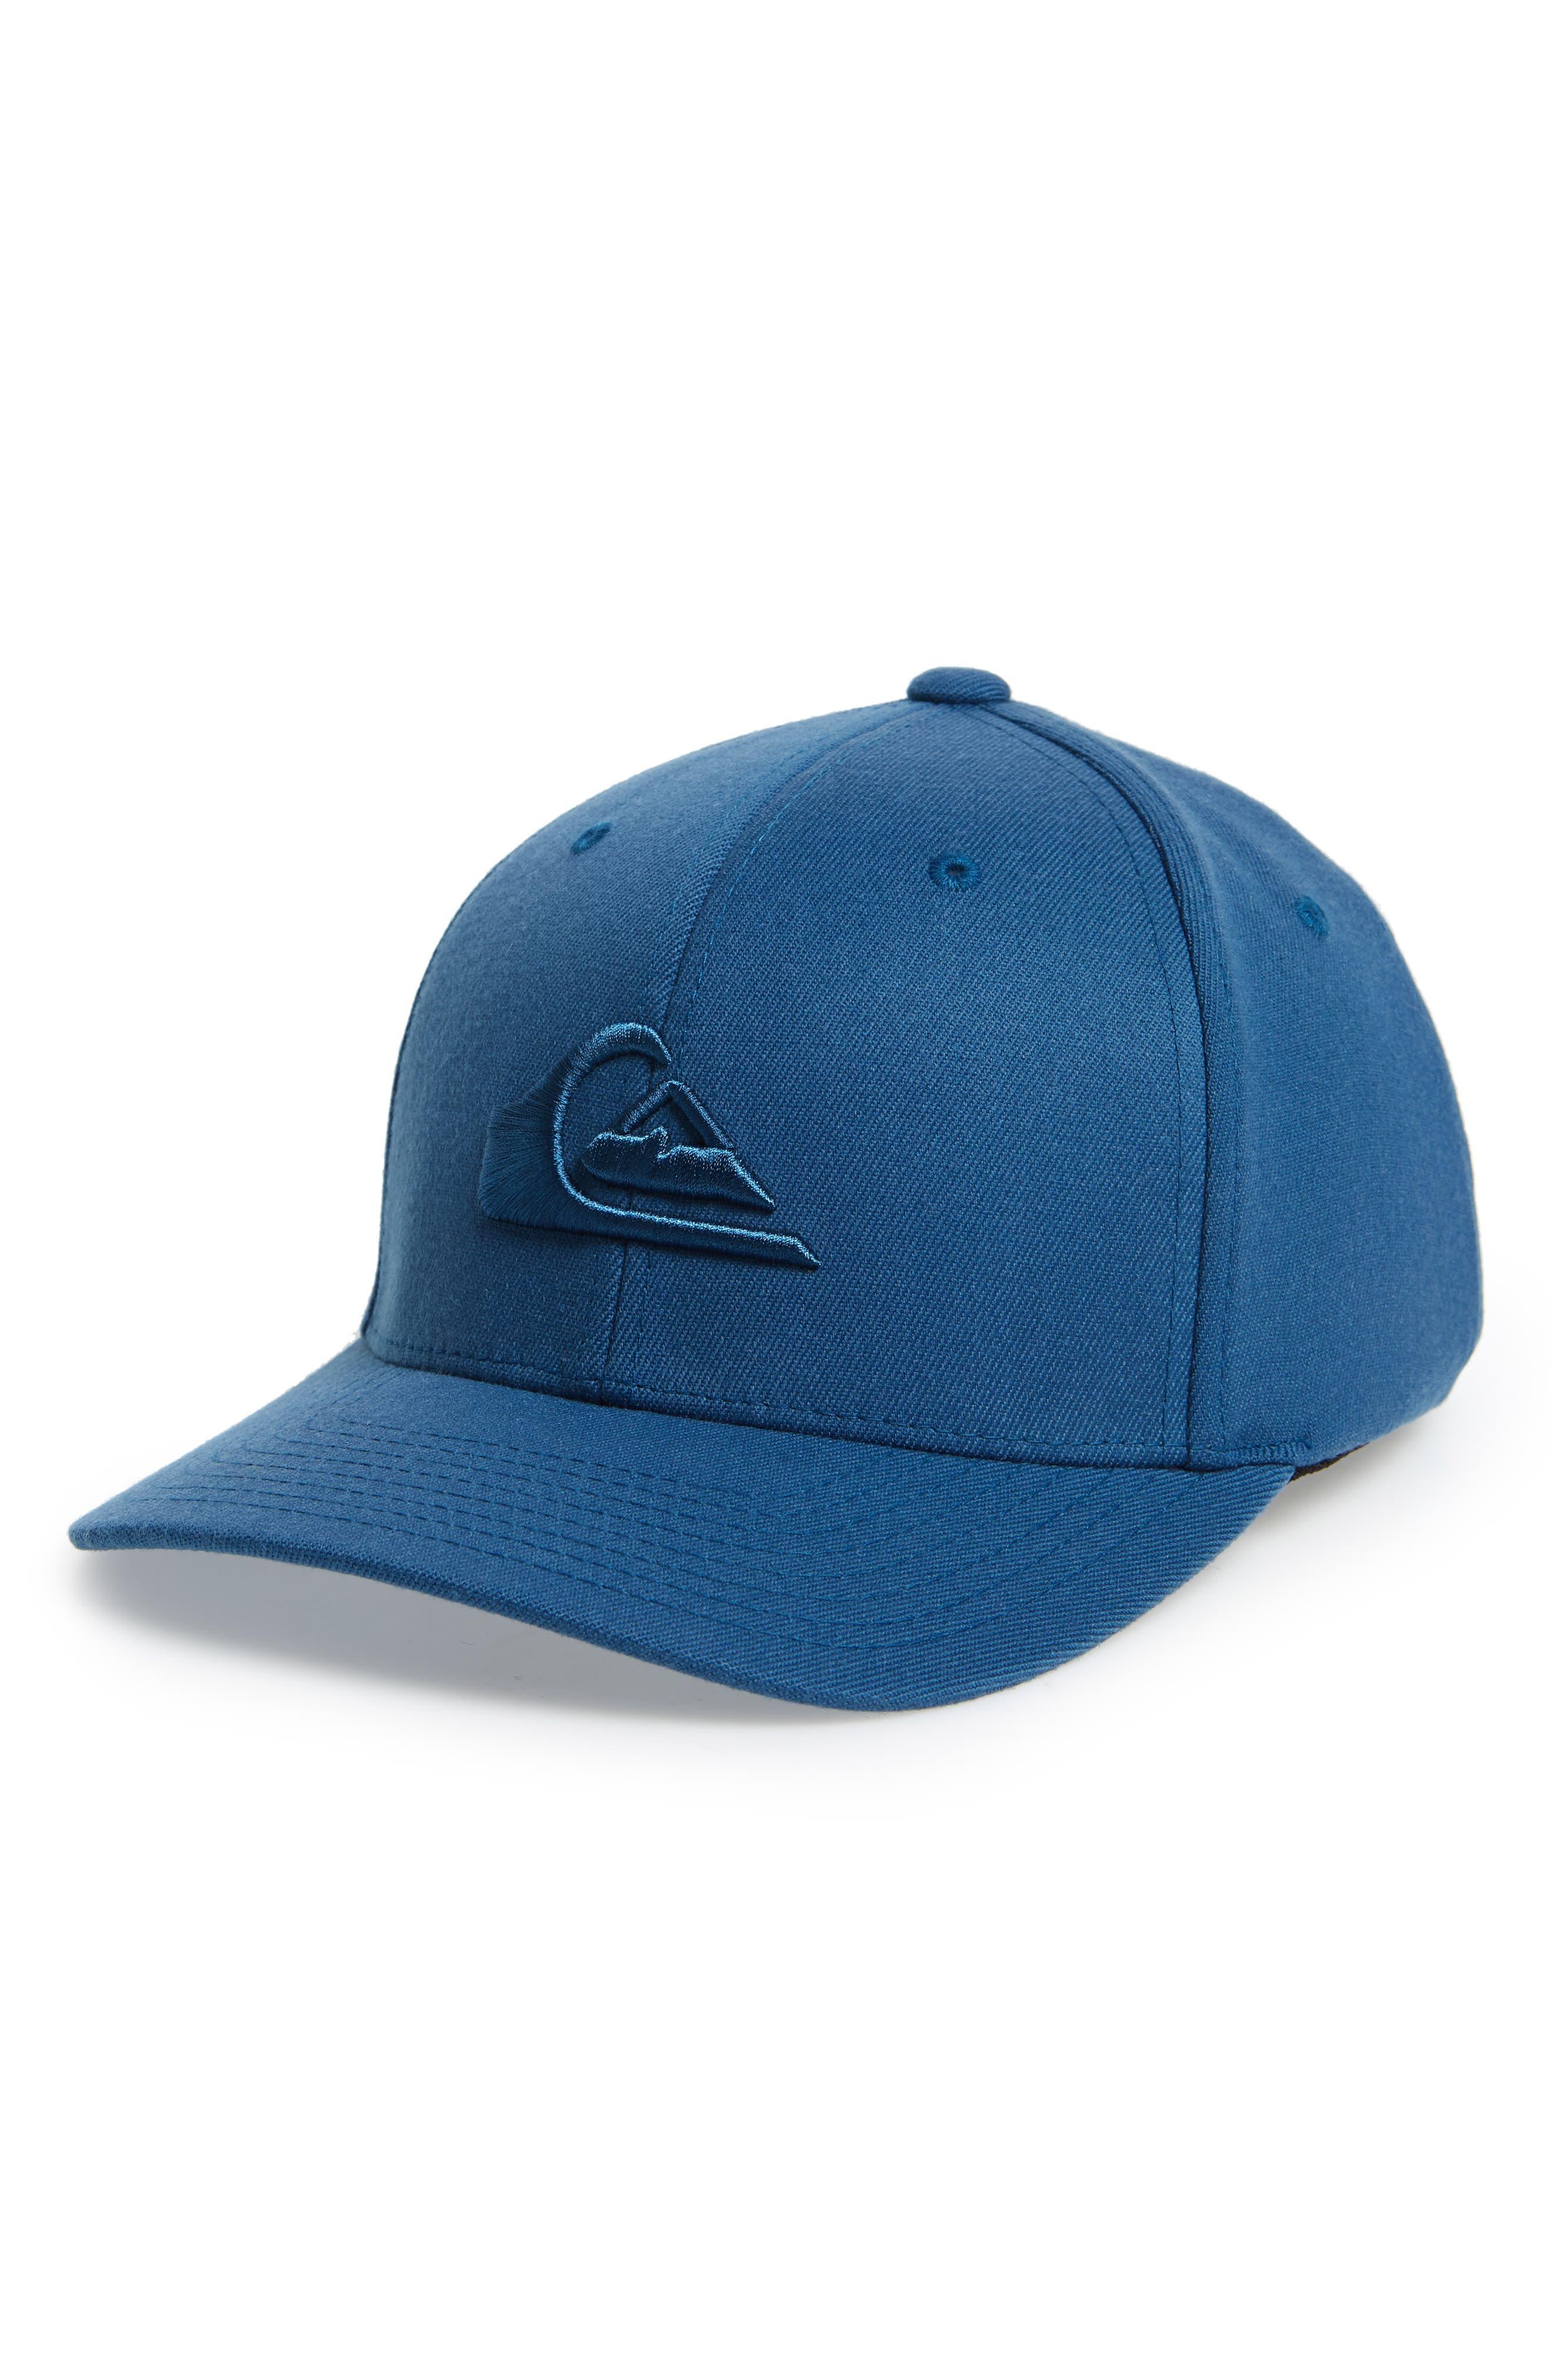 Mountain & Wave Baseball Cap,                             Main thumbnail 1, color,                             Real Teal